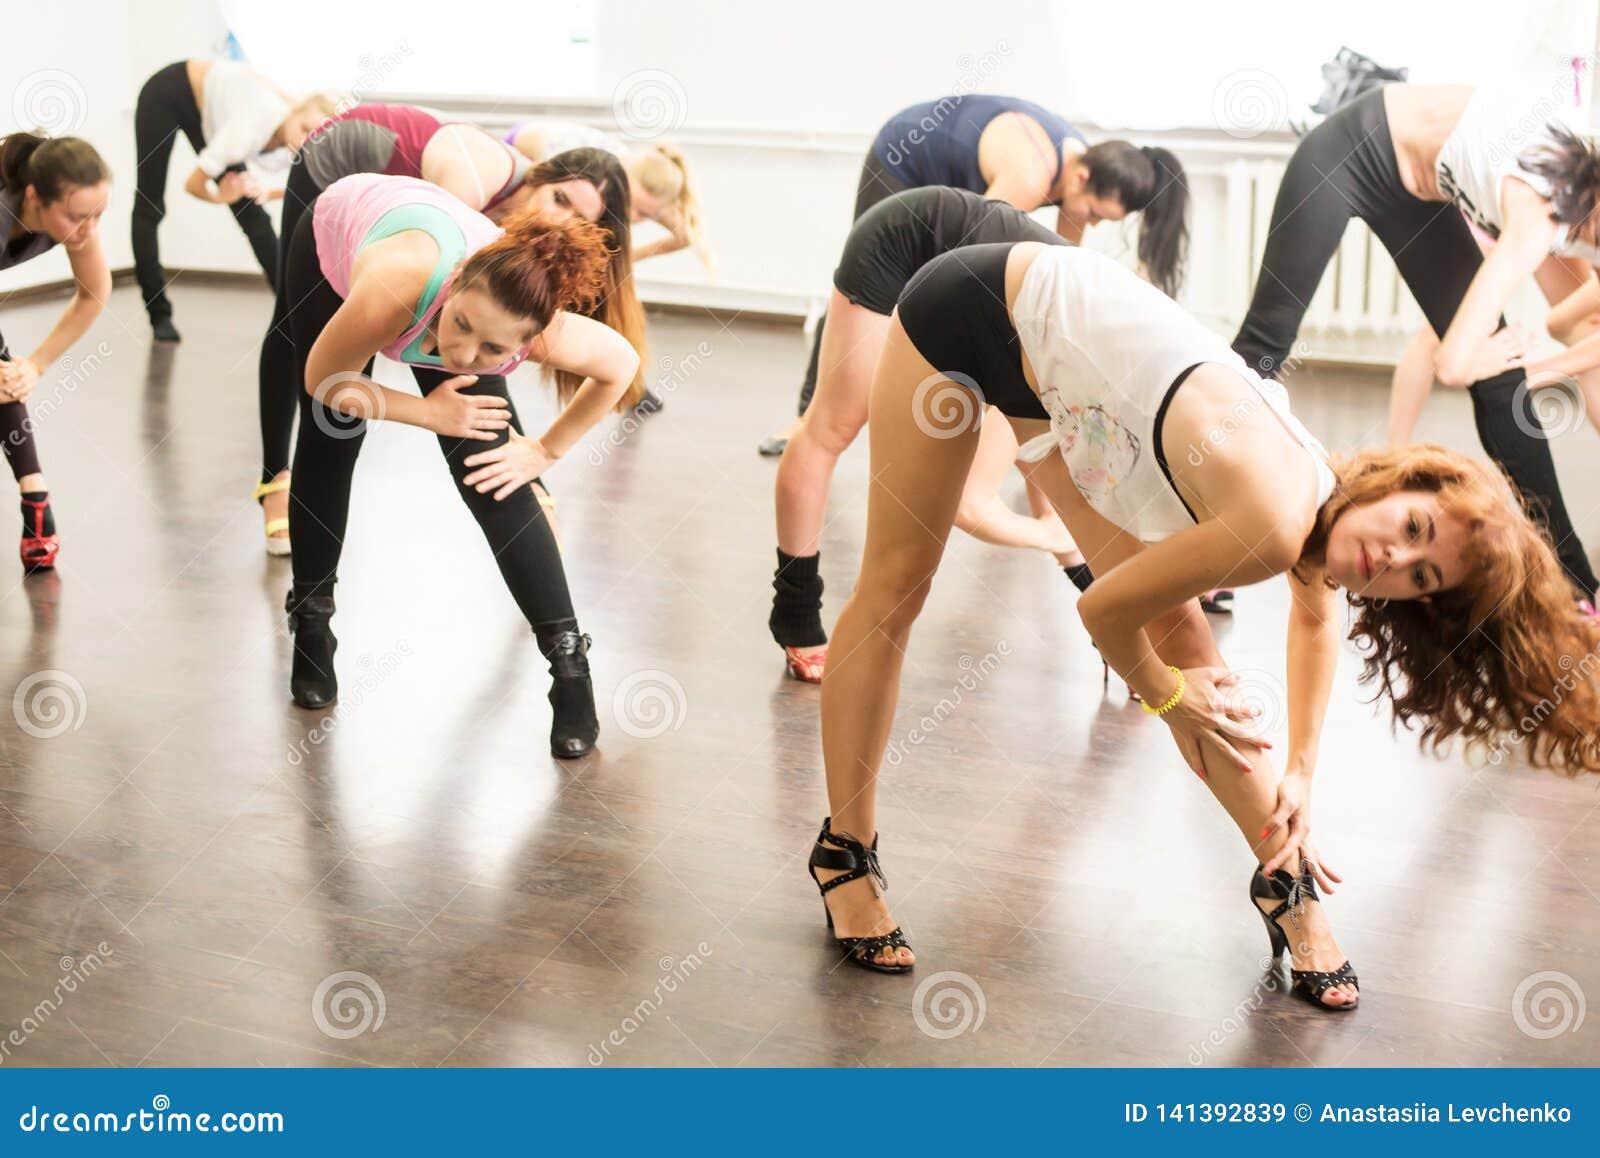 Kiev. Ukraine. 06.20.2018.girls stretch his legs in the splits on the dance lessons